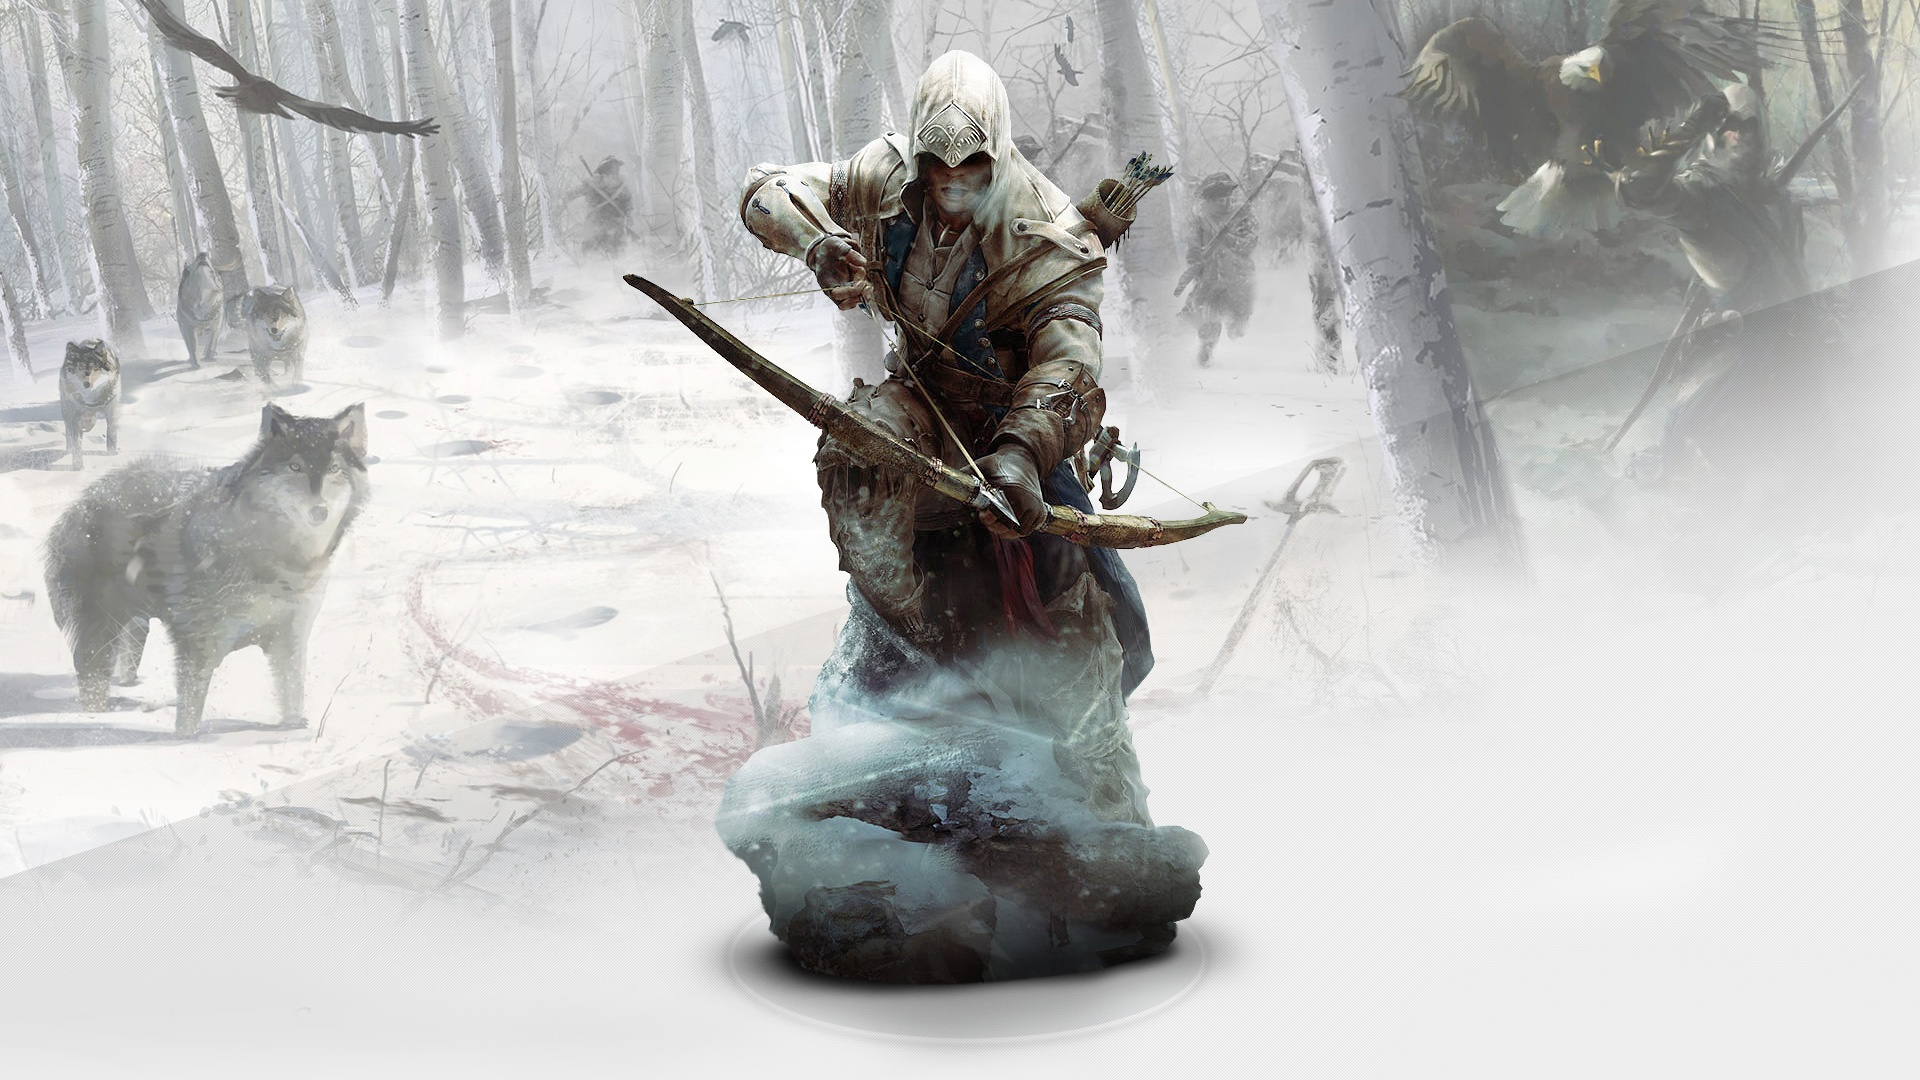 Ratonhnhaketon Assassins Creed 3 Wallpapers